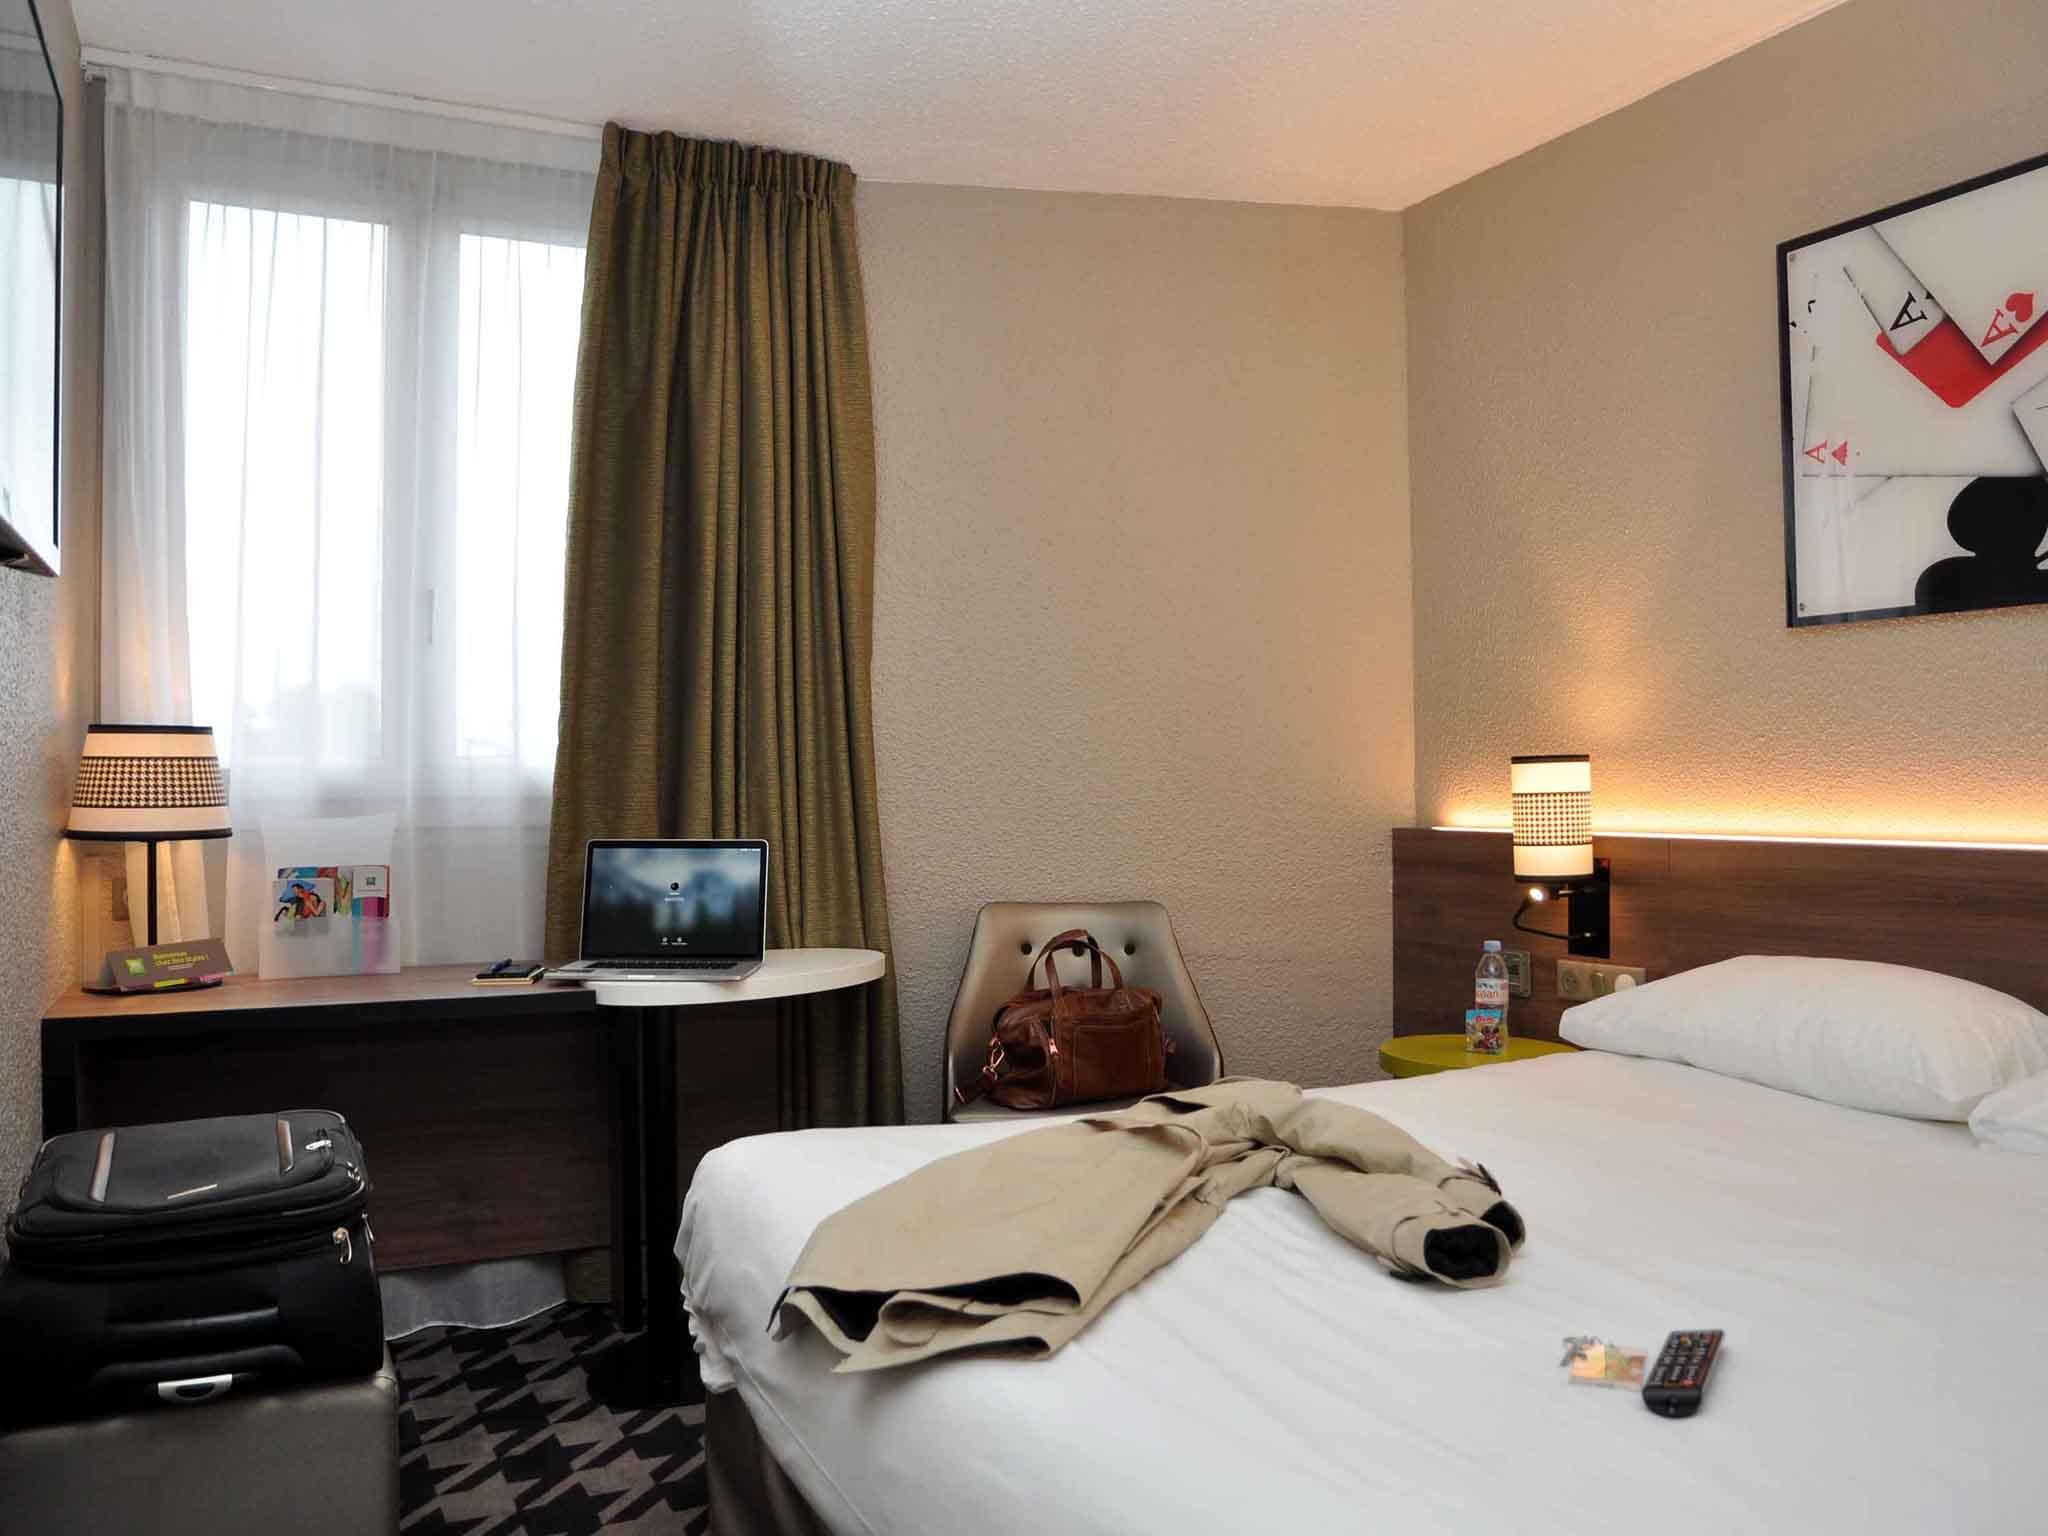 Hotel a barentin ibis styles rouen nord barentin for Adagio rouen